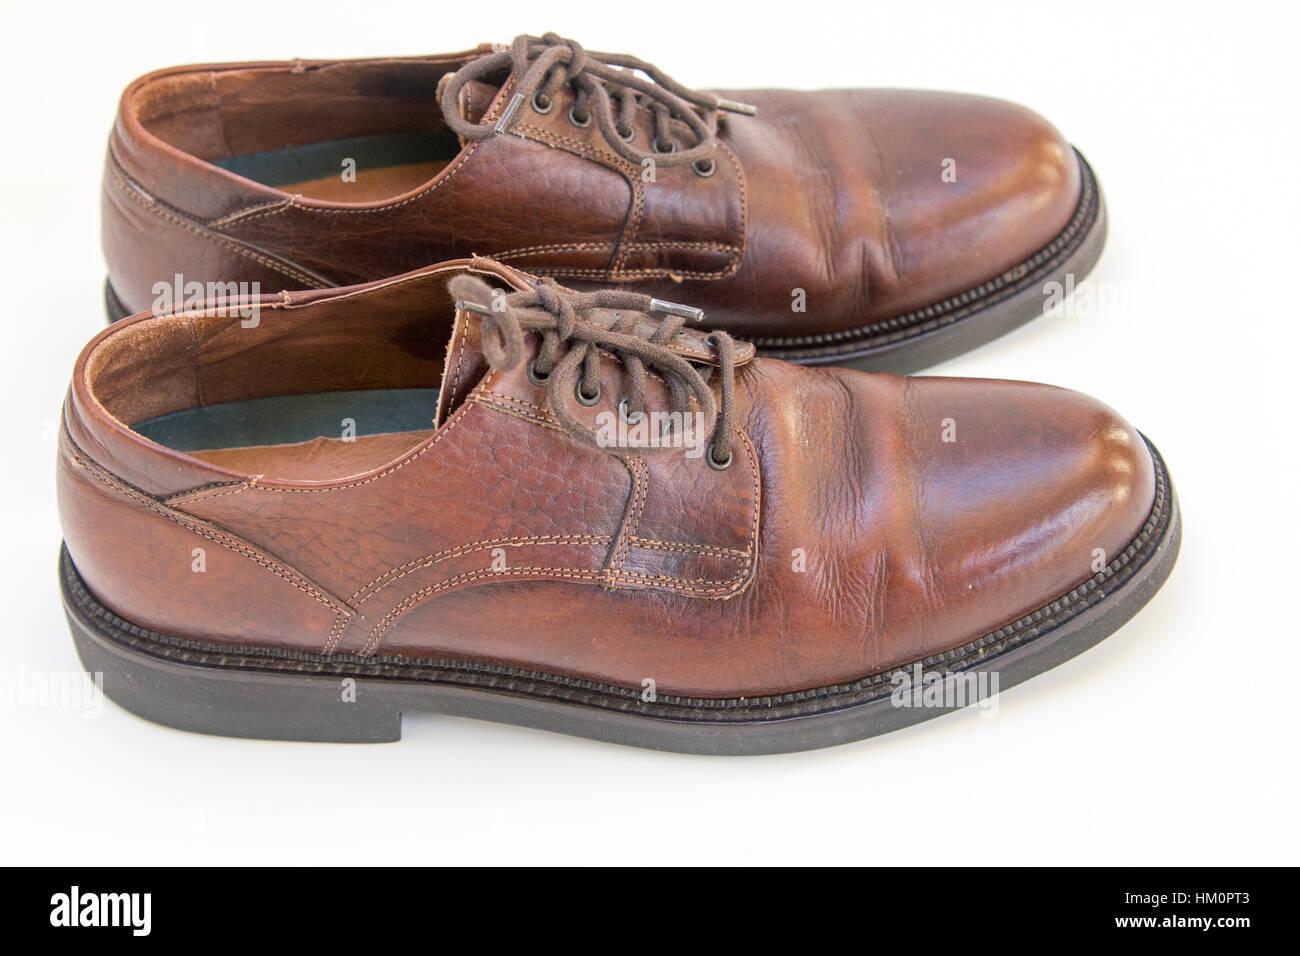 Zapatos gastados Imagen De Stock